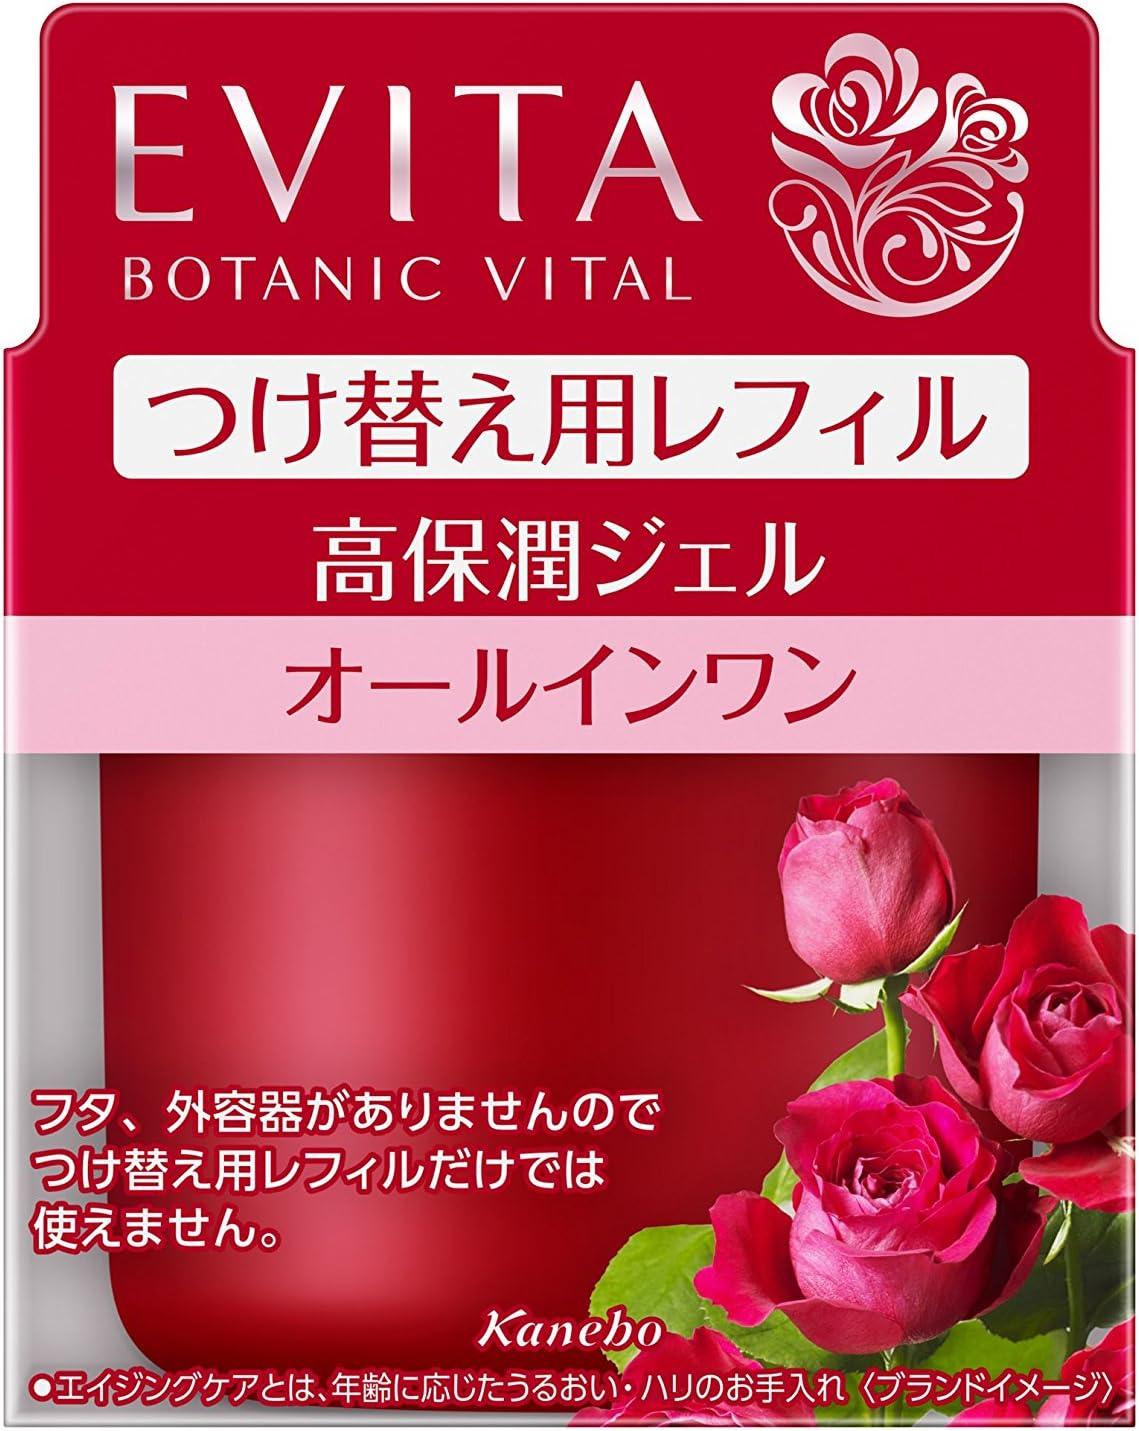 Kanebo Evita Botani Vital Boston Mall Deep 90g Refill Gel Moisture Factory outlet